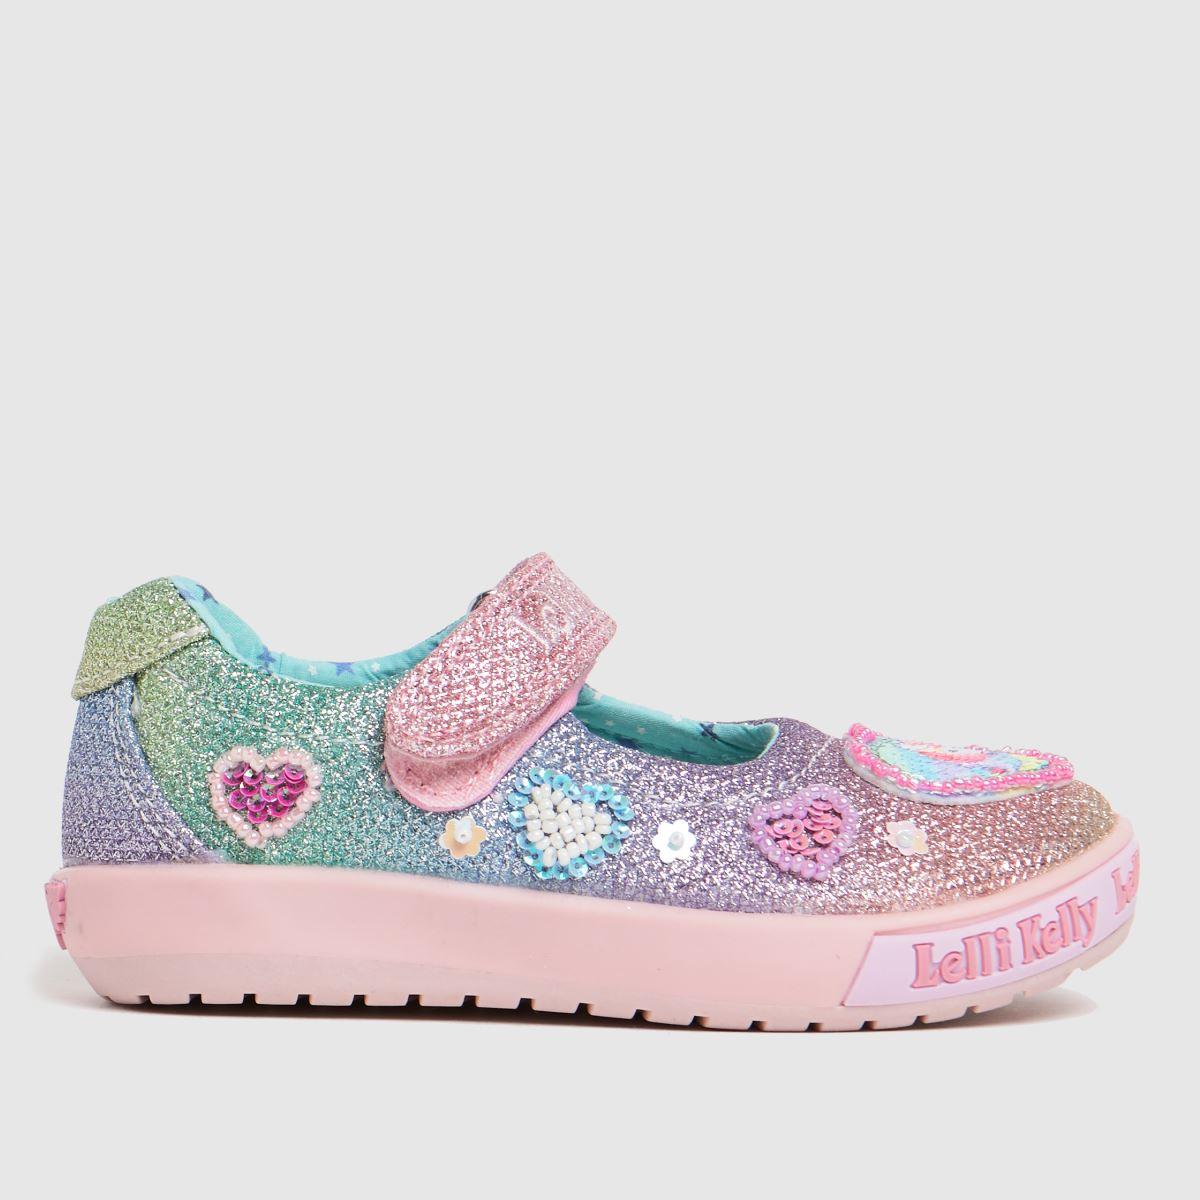 Lelli Kelly Multi Lk Gem Baby Dolly Tdlr Boots Toddler